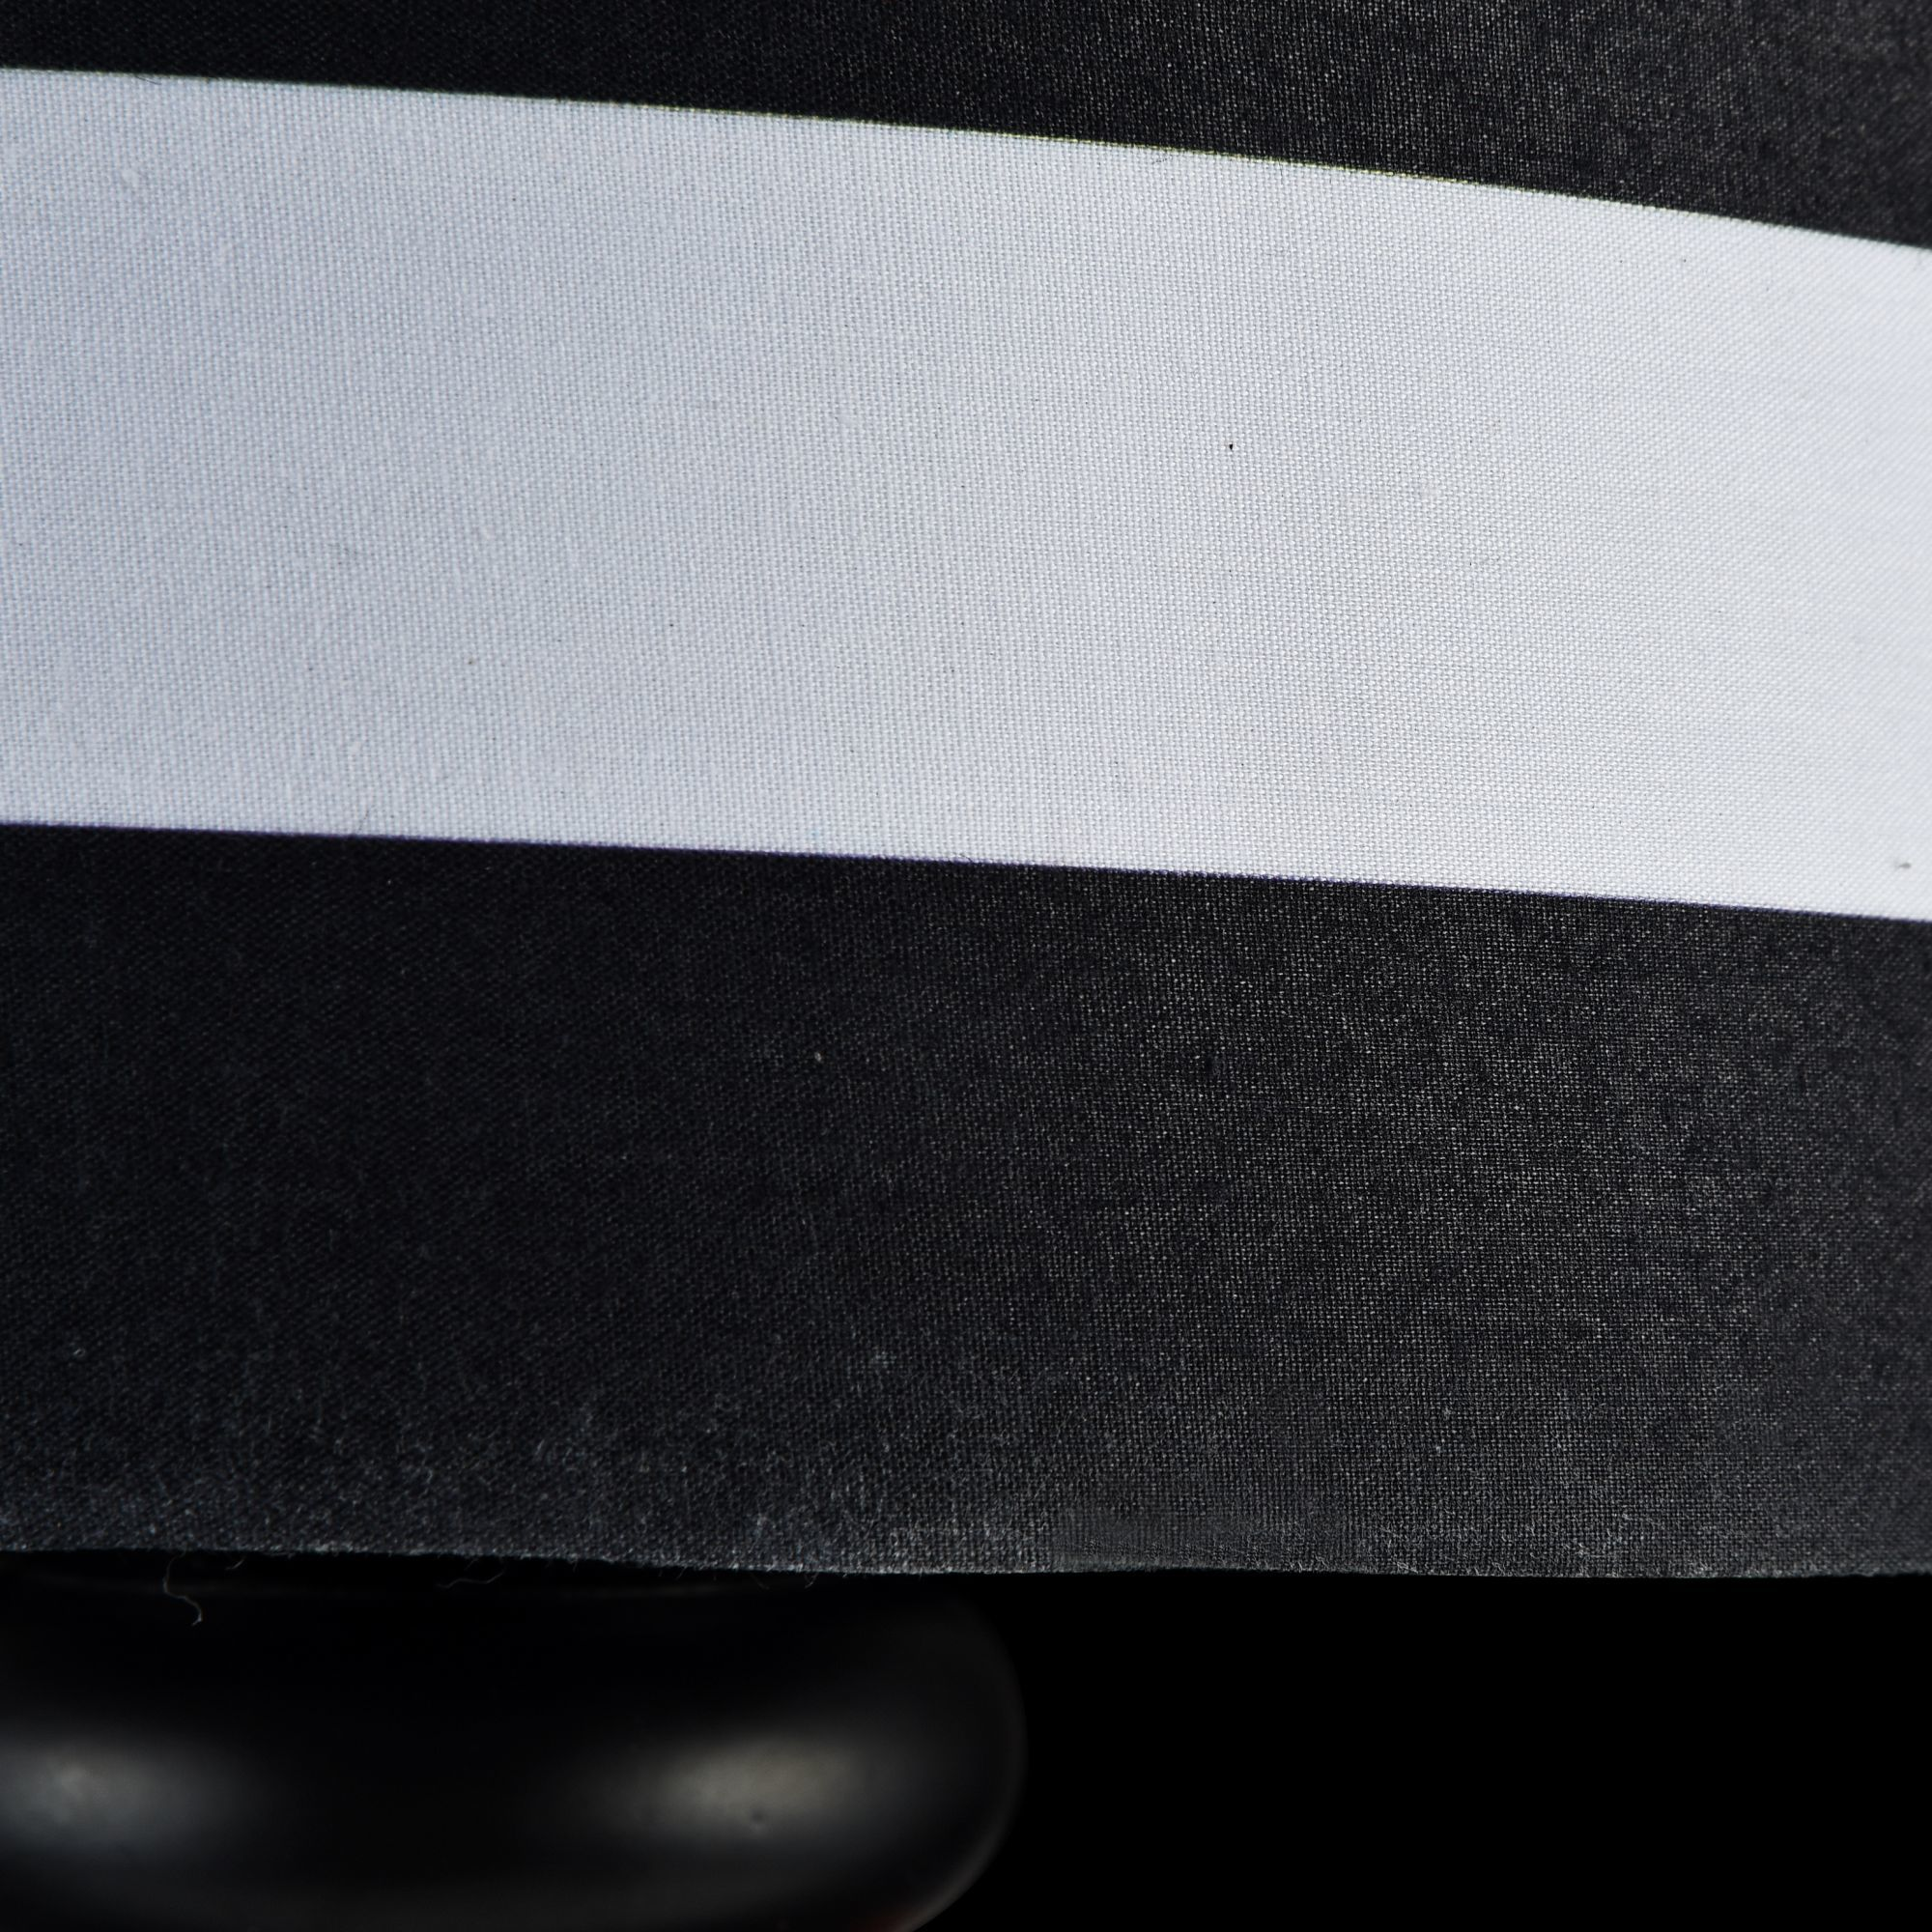 Бра Maytoni Sailor MOD963-WL-01-B, 1xE14x40W, черный, черно-белый, металл, текстиль - фото 6